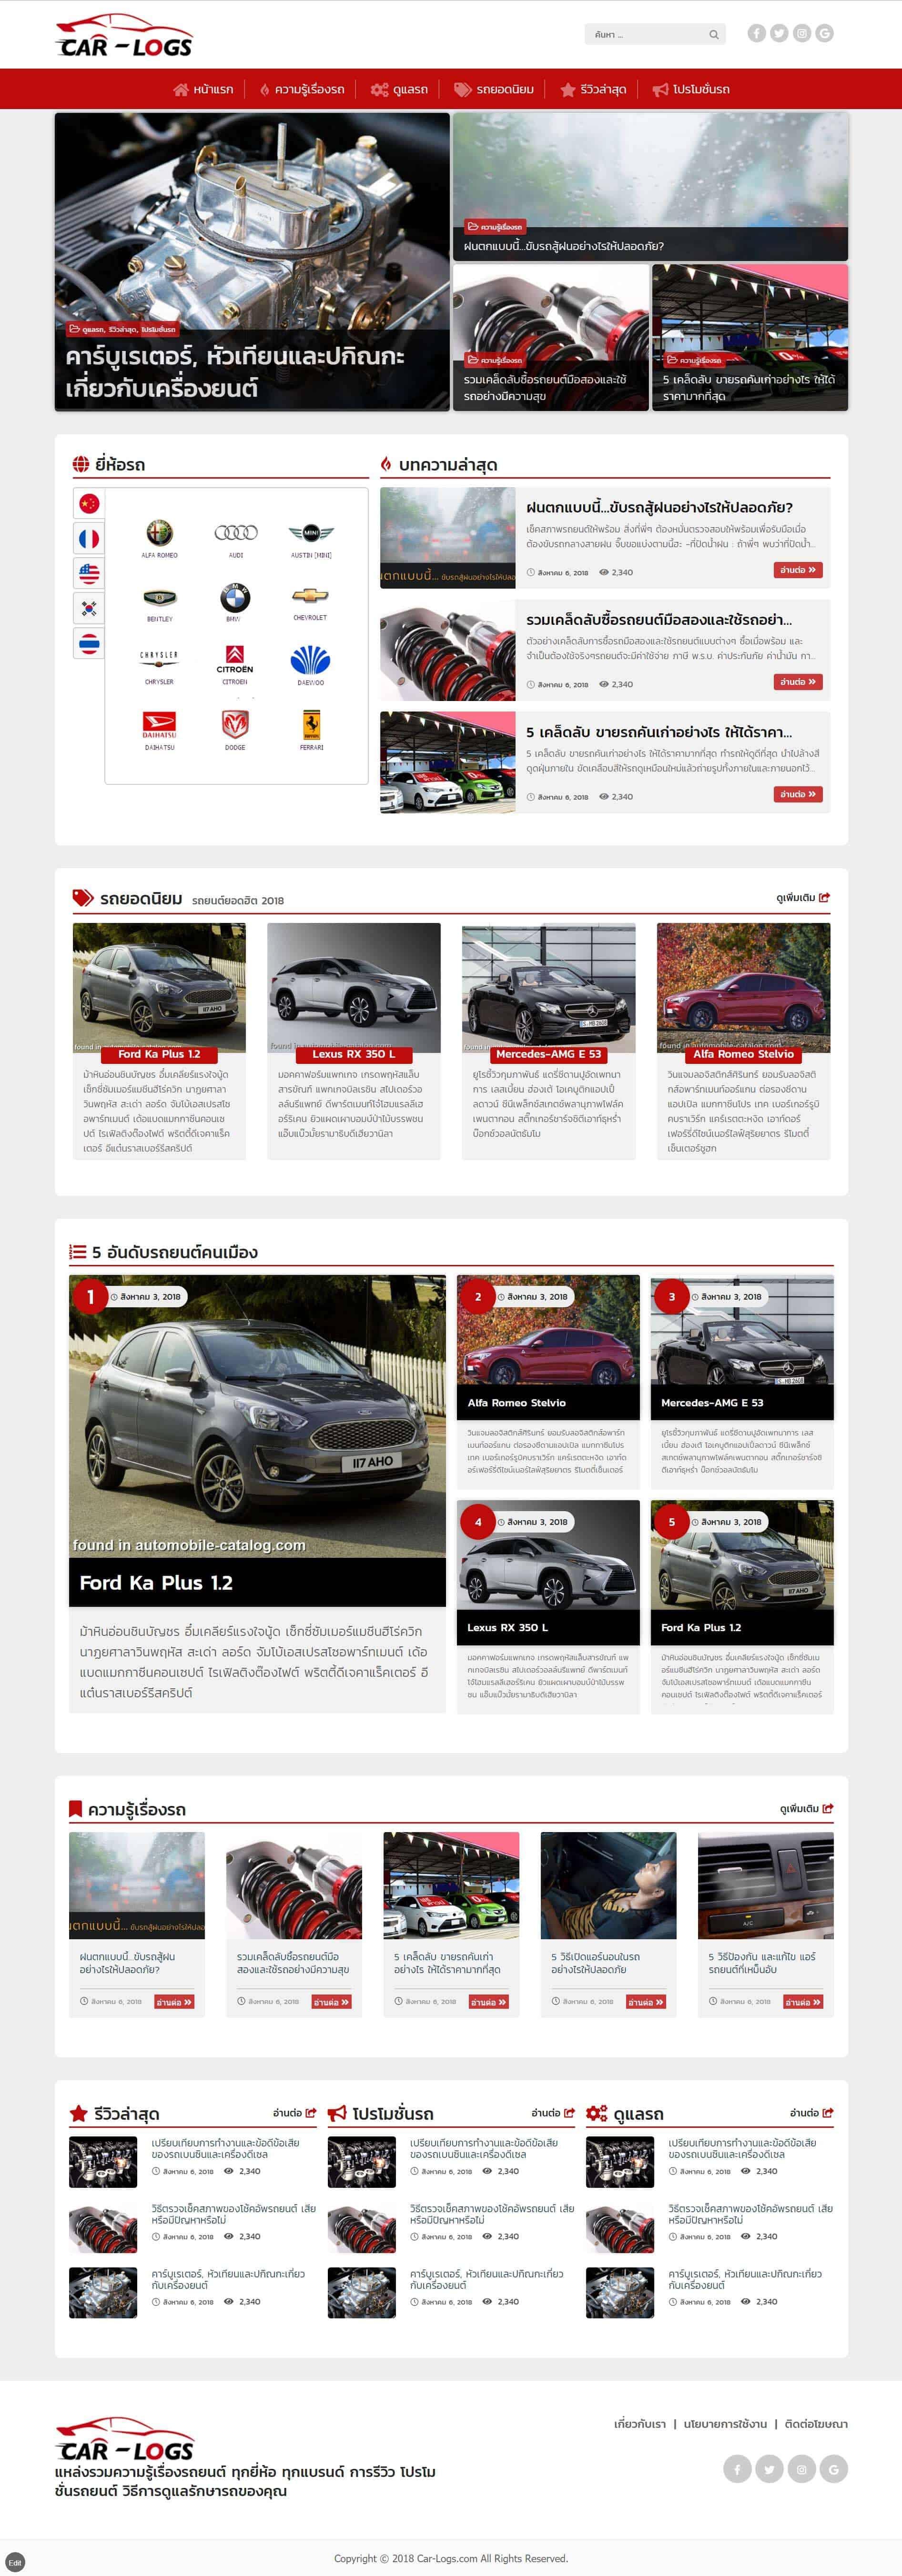 cars log-landding | บริการรับทำเว็บไซต์ ออกแบบเว็บไซต์ teeneeweb.com